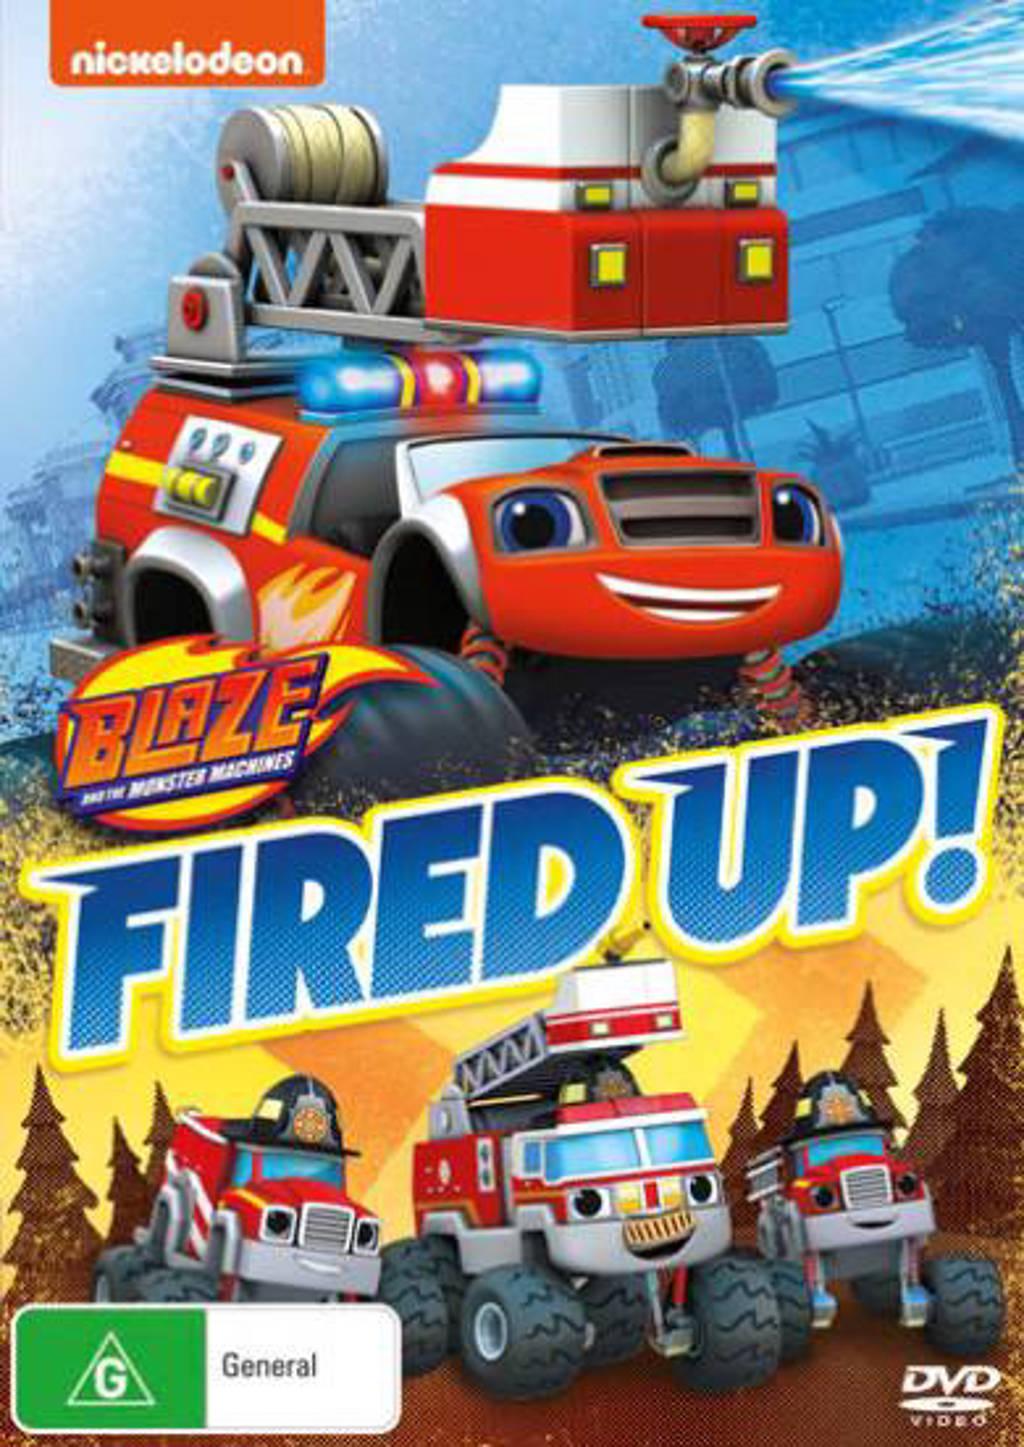 Blaze & The monster machine - Fired up! (DVD)